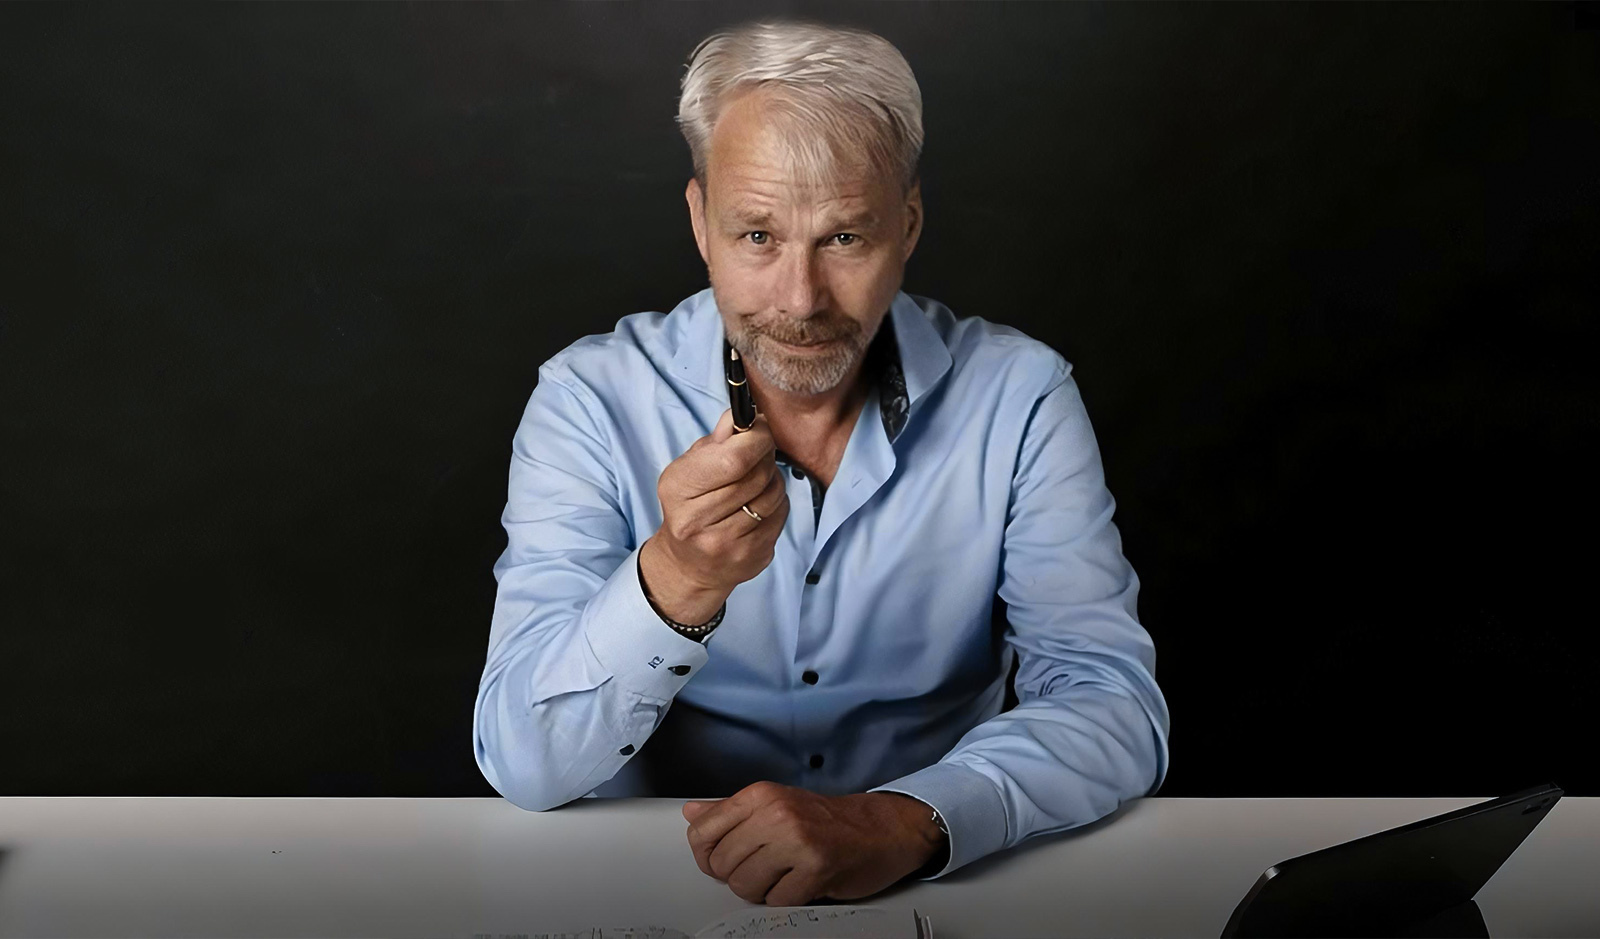 https://www.bauligconsulting.de/wp-content/uploads/2021/03/Rainer-Ehrlich3.jpg